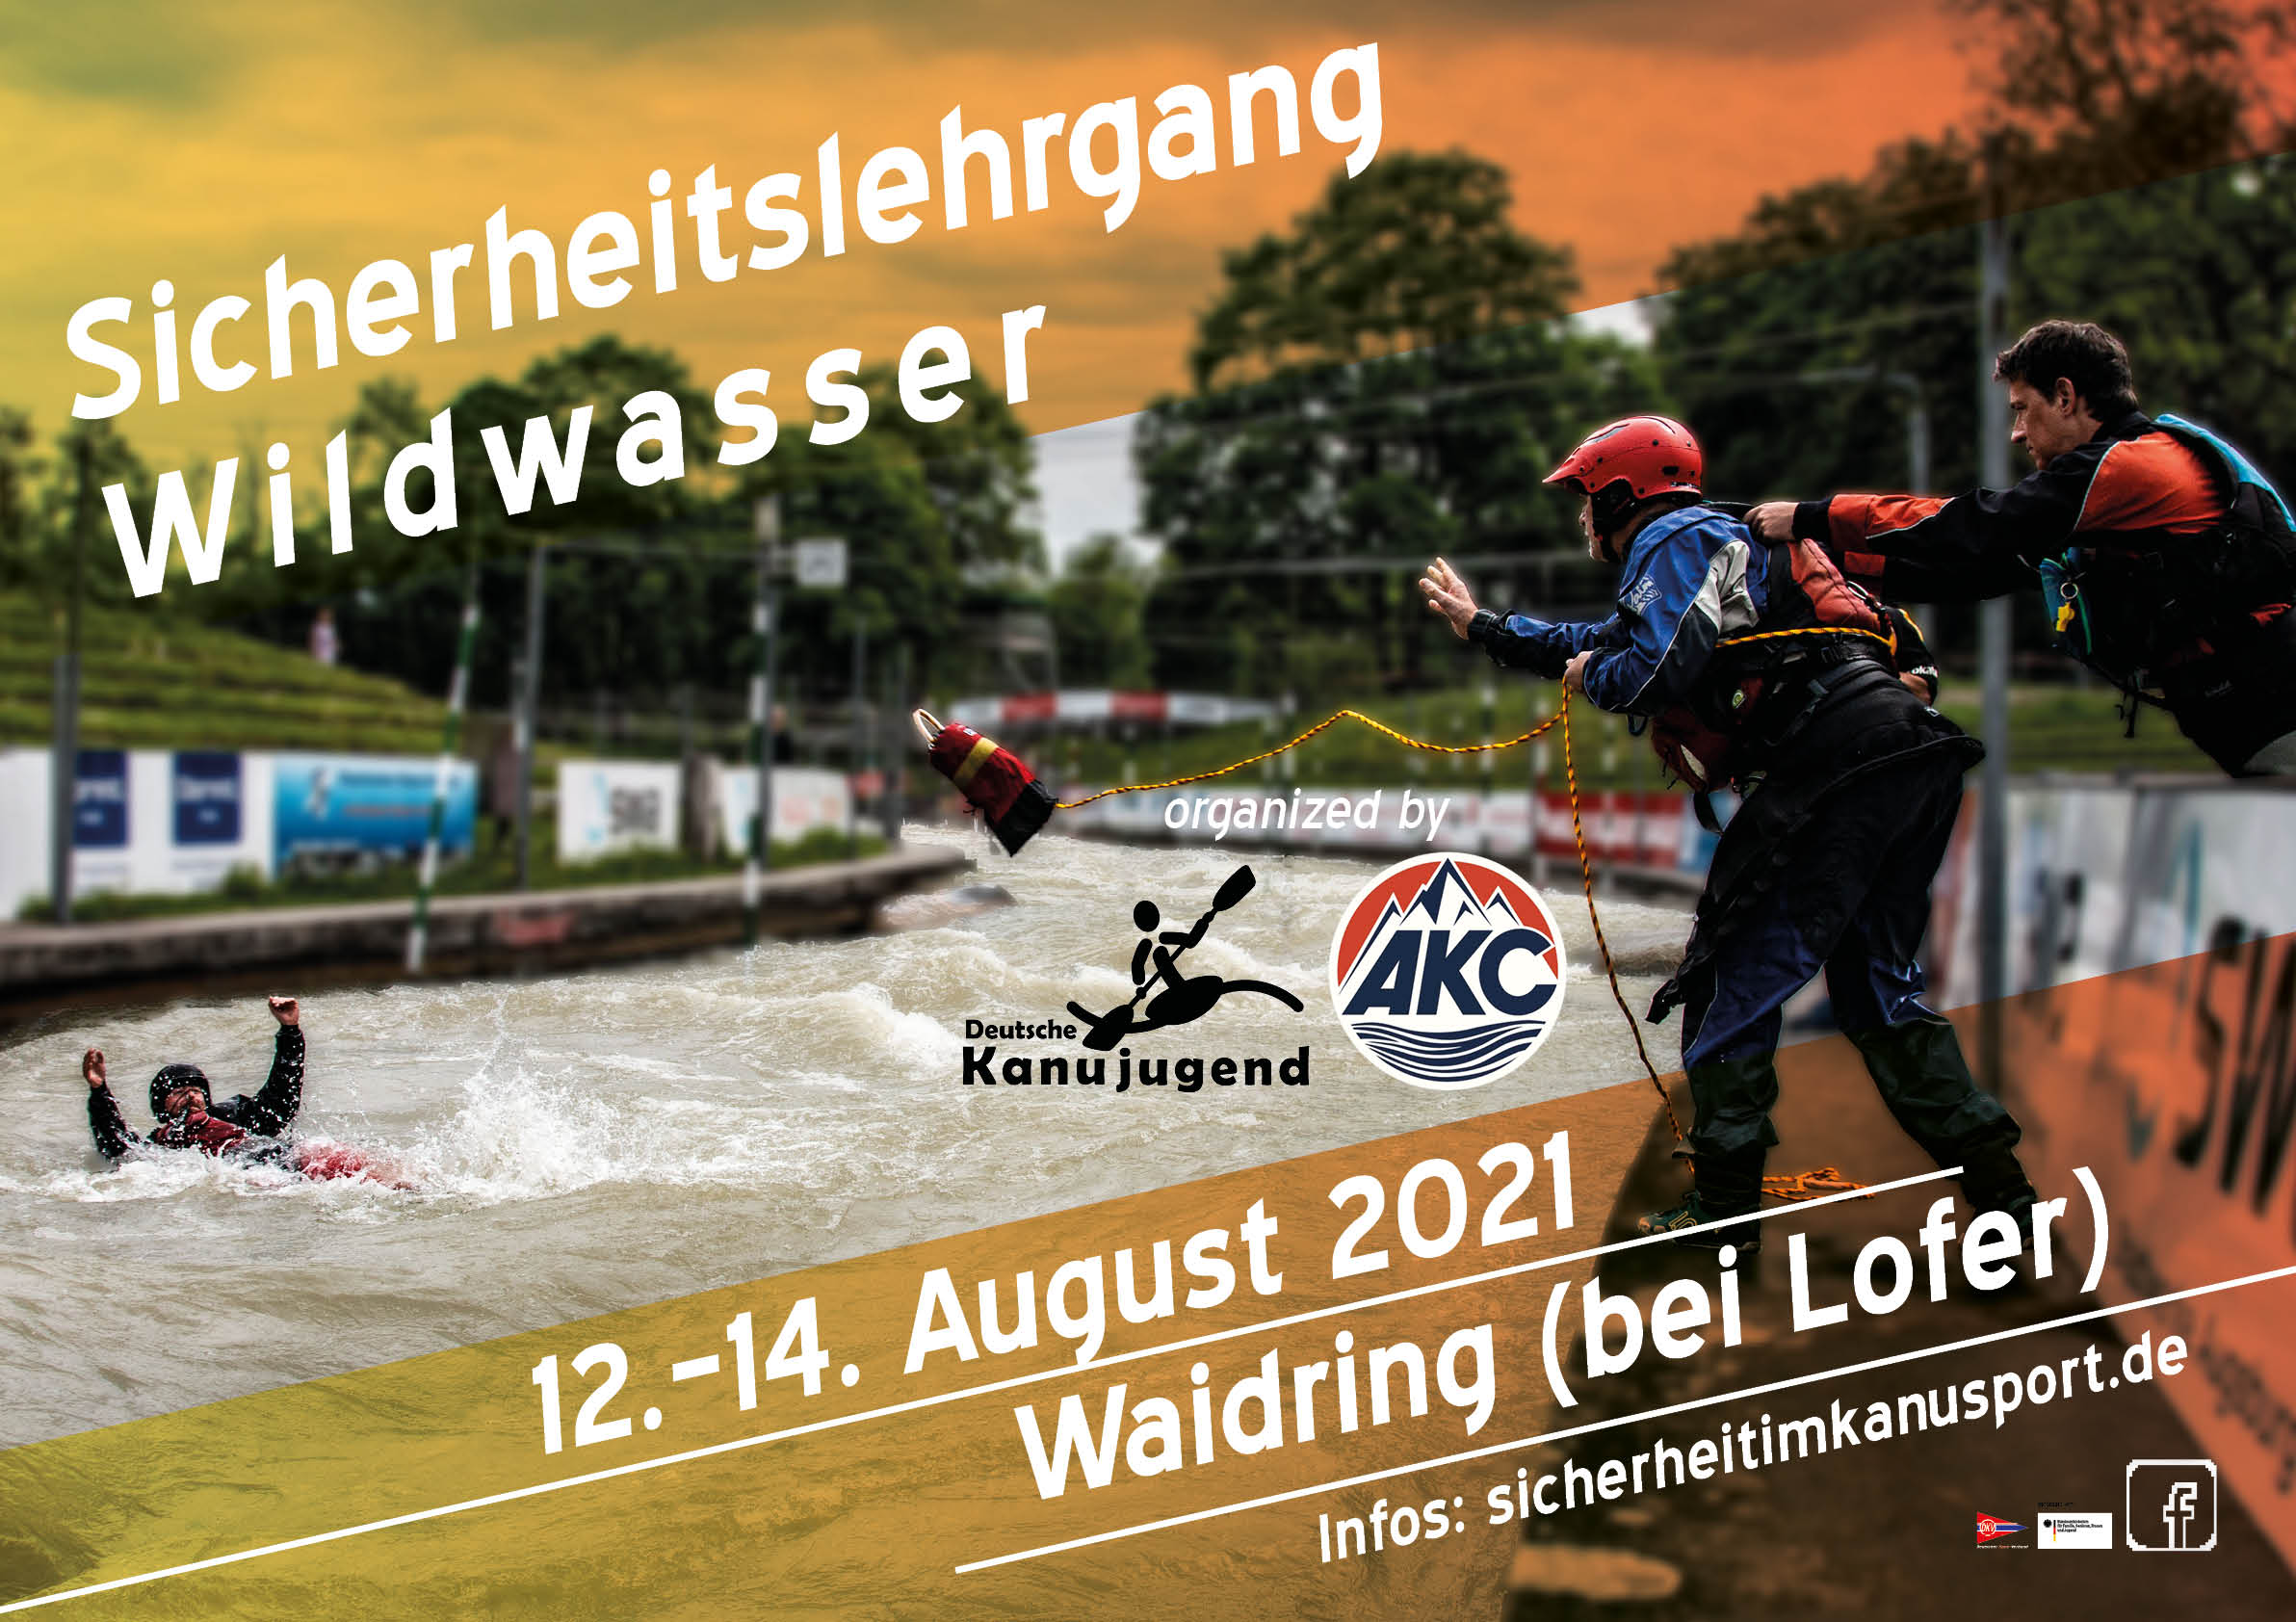 Plakat - Sicherheitslehrgang Wildwasser Waidring (AUT) 2021